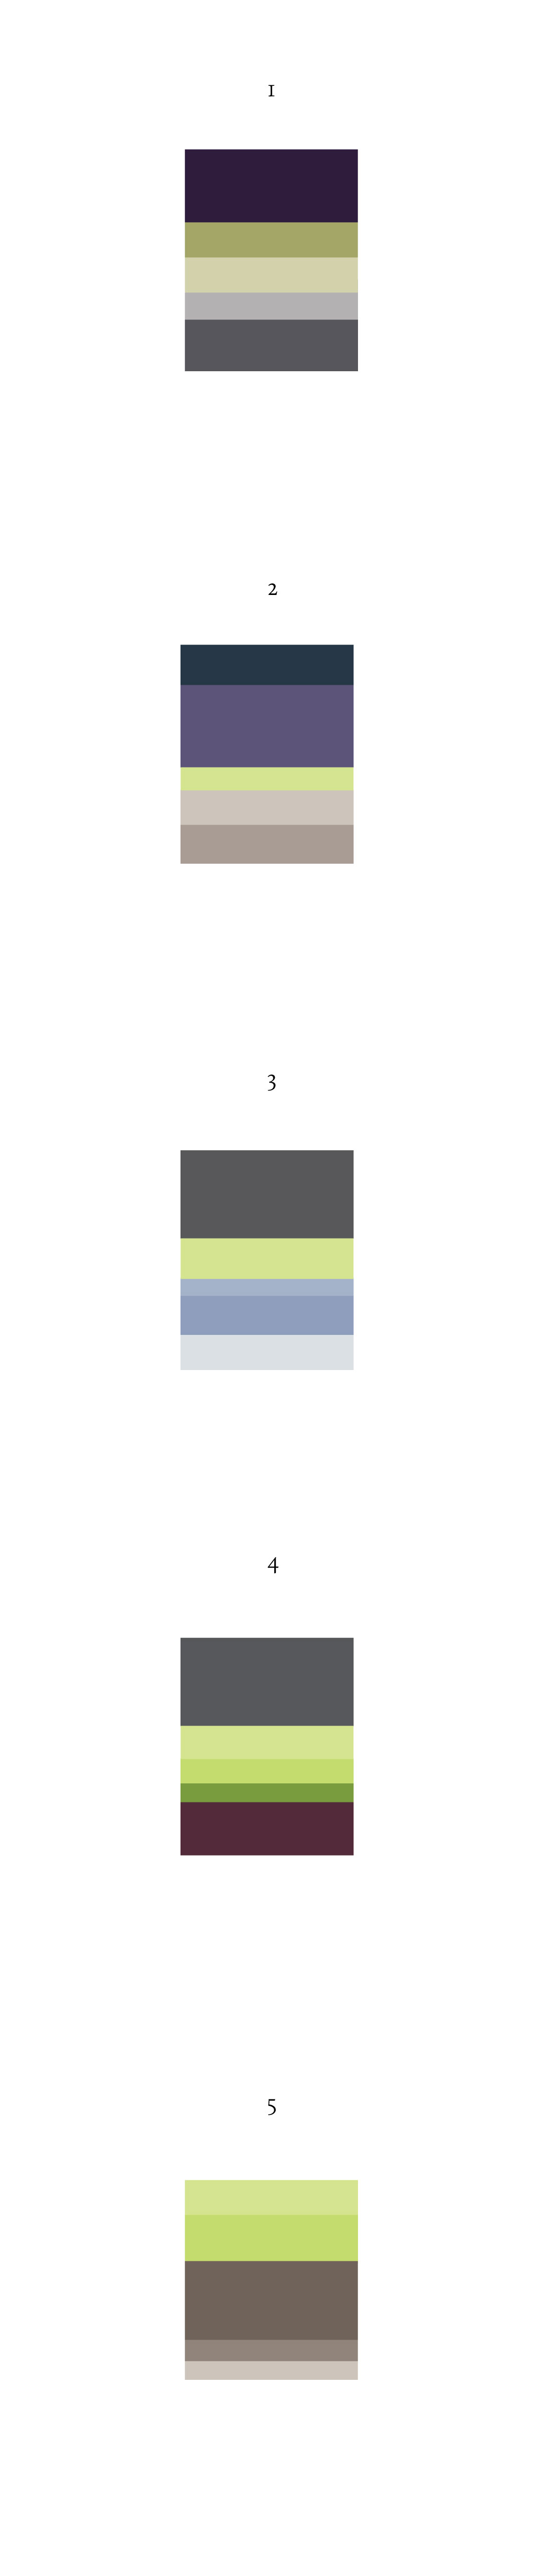 color-ideas-1